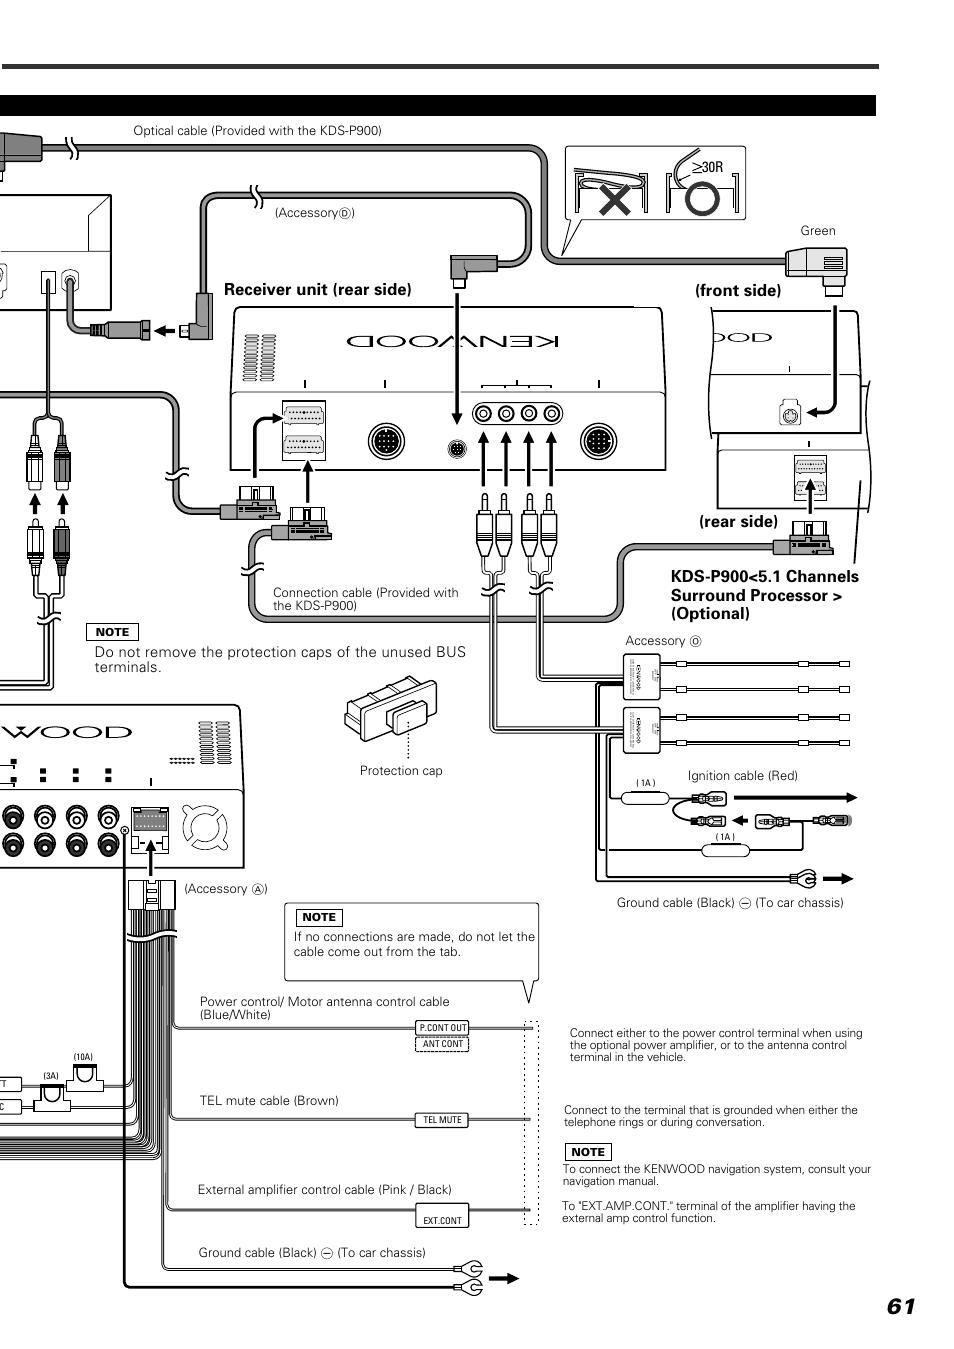 Kenwood Kvt 54 Manual Box Wiring Diagram 817dvd Excelon Dvd Player Receiver Unit Rear Side 920dvd User Page 61 617dvd